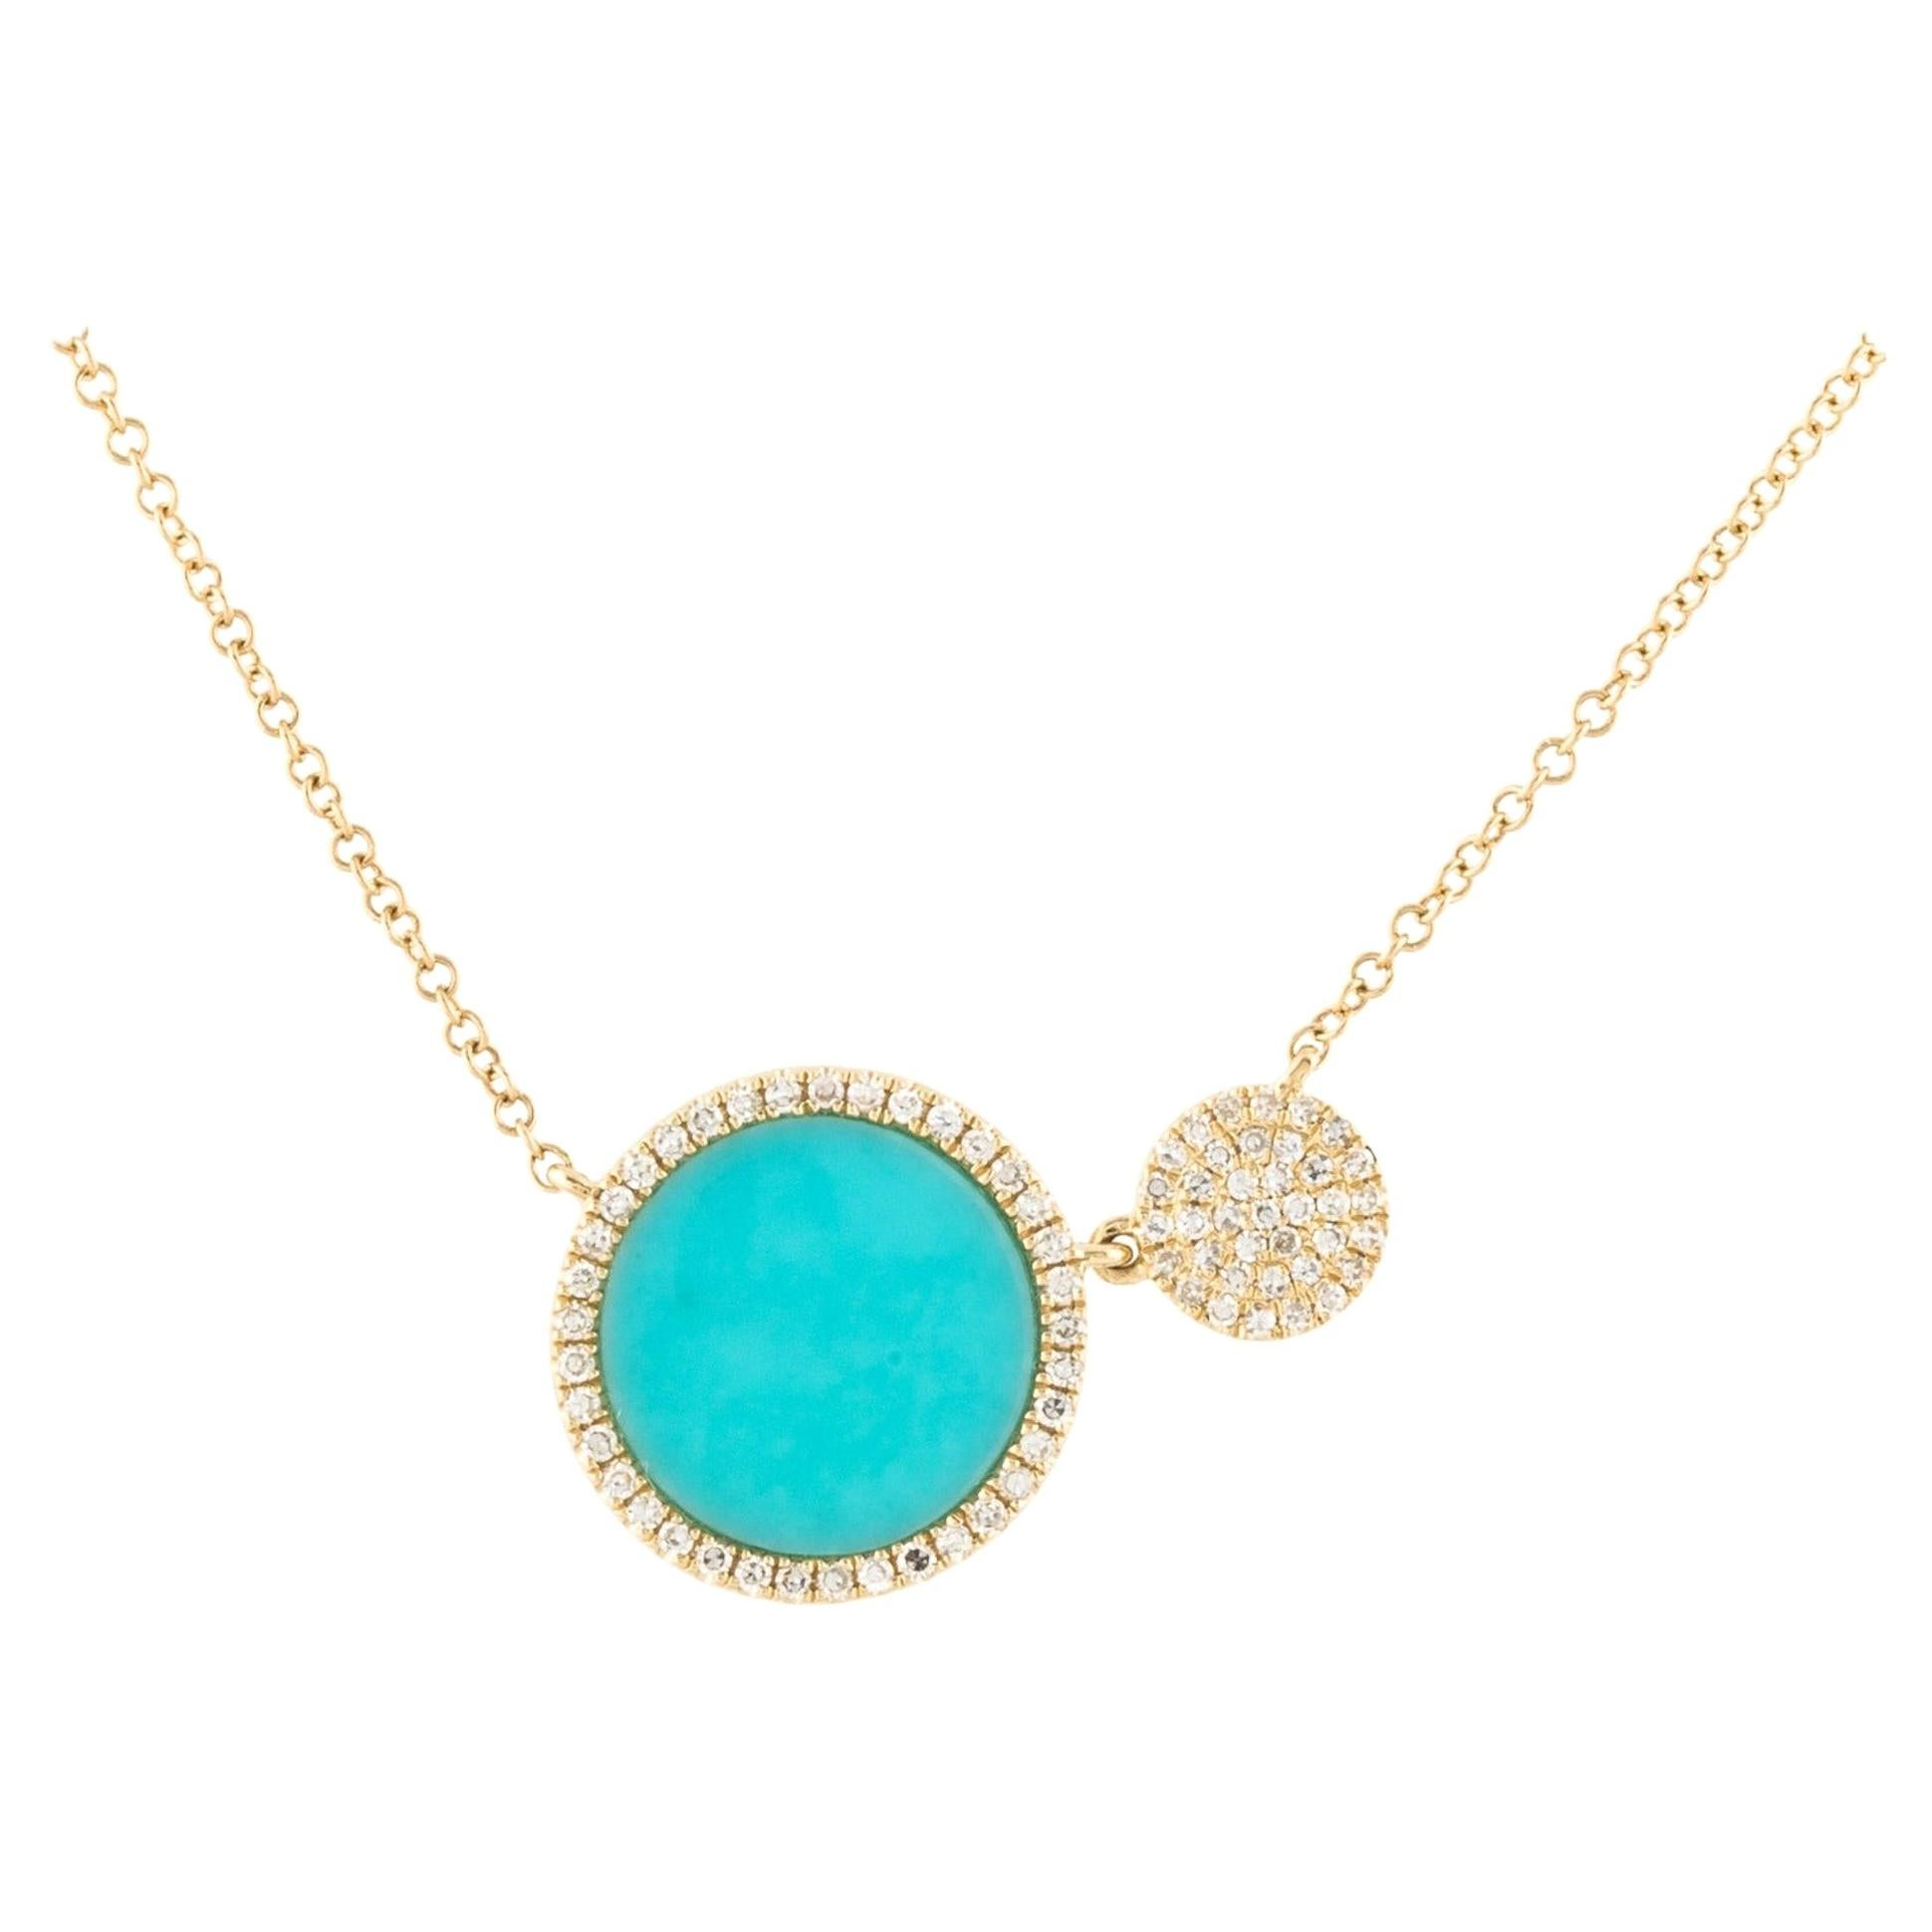 14 Karat Yellow Gold 0.22 Carat Diamond and Turquoise Pendant Necklace